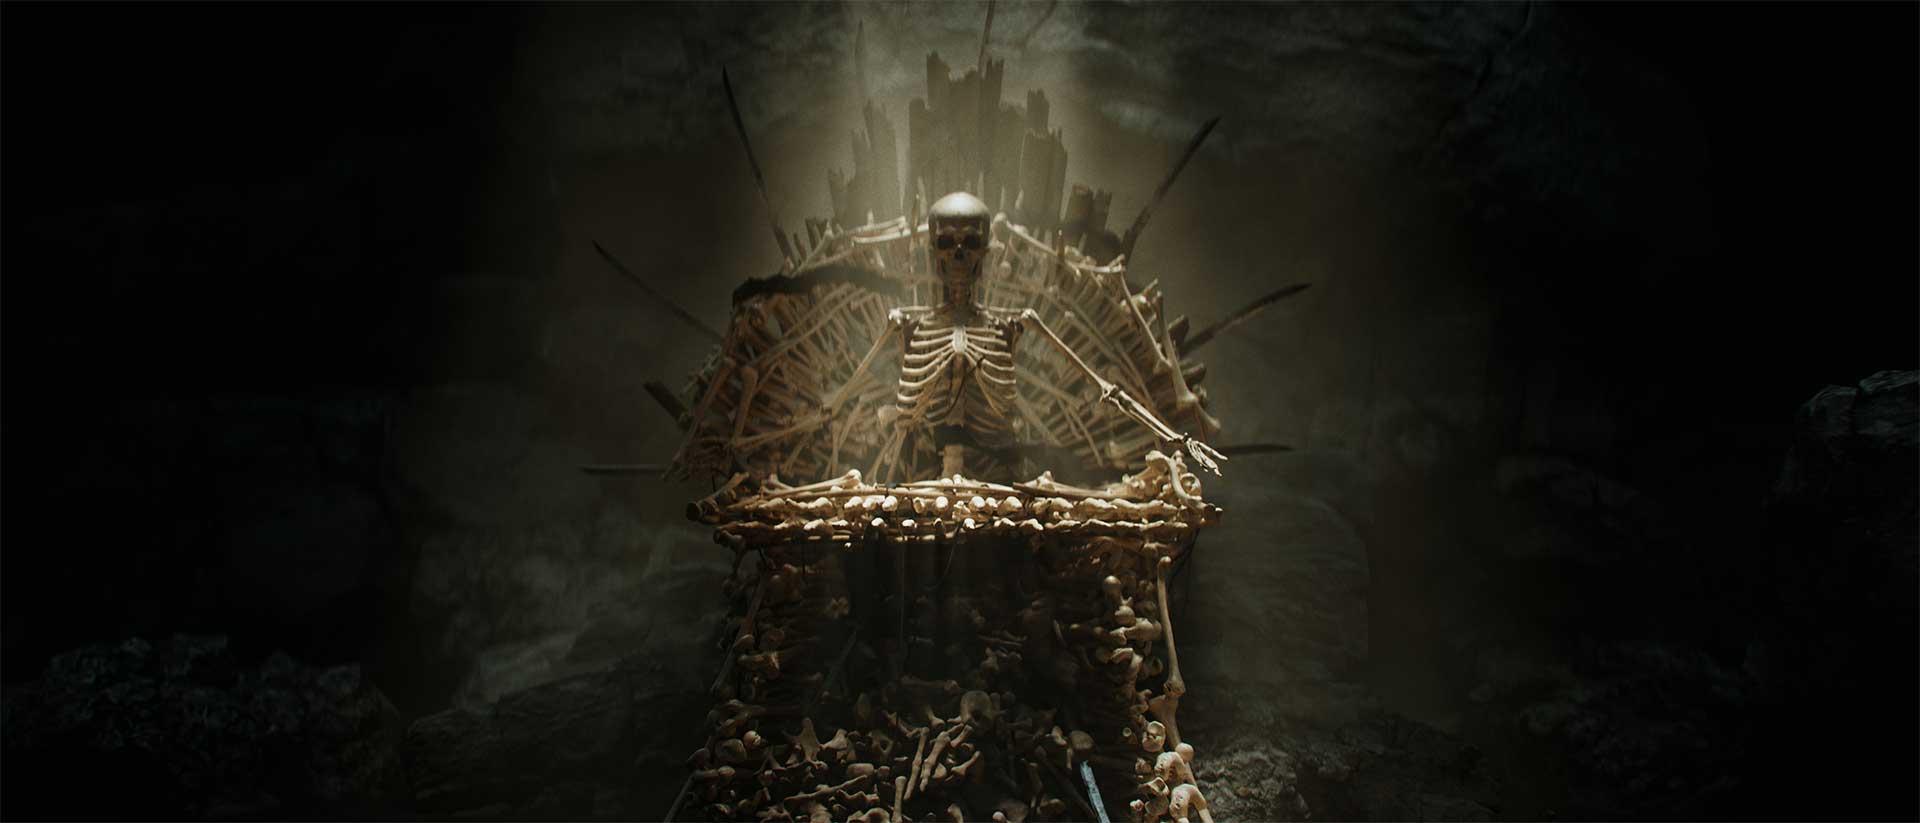 """One-Eyed Willy"" Escape Room Trailer by Edu Torres and Diego Cavallaro | STASH MAGAZINE"